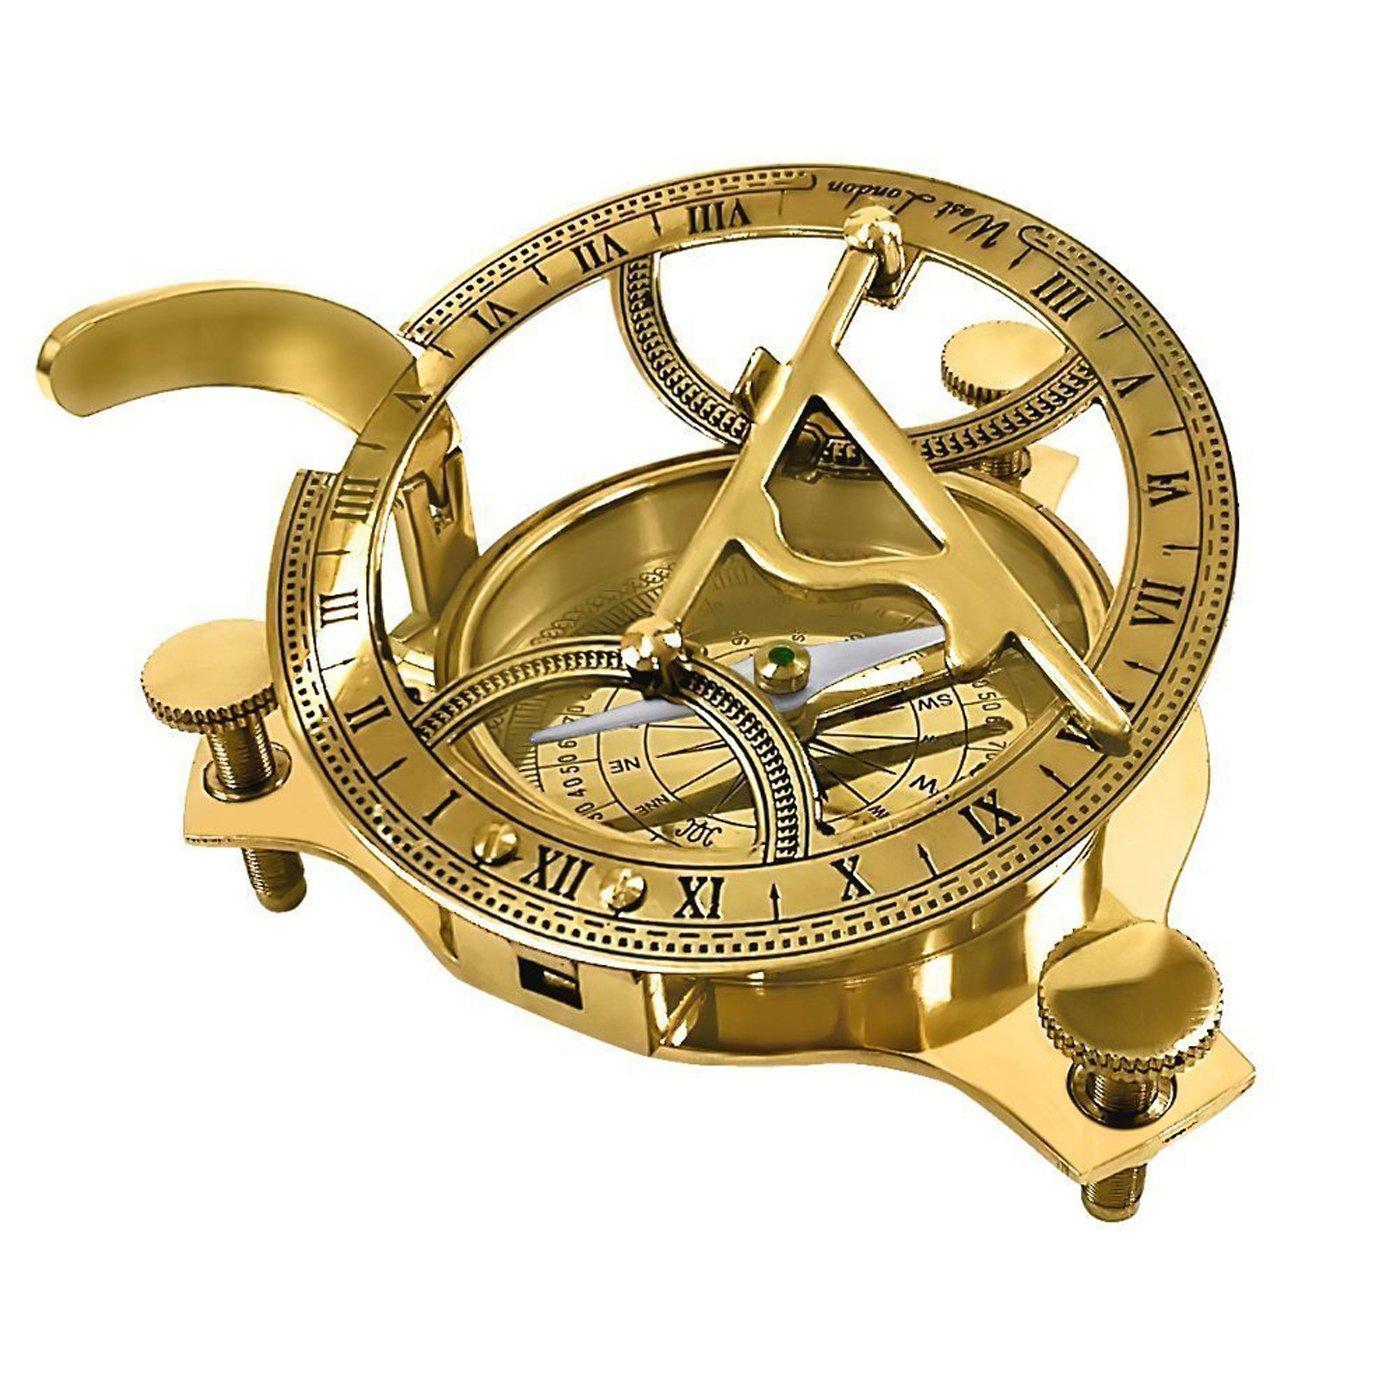 PARIJAT HANDICRAFT 3'' Sundial Compass - Solid Brass Sun Dial Beautiful Nautical Sundial Compass